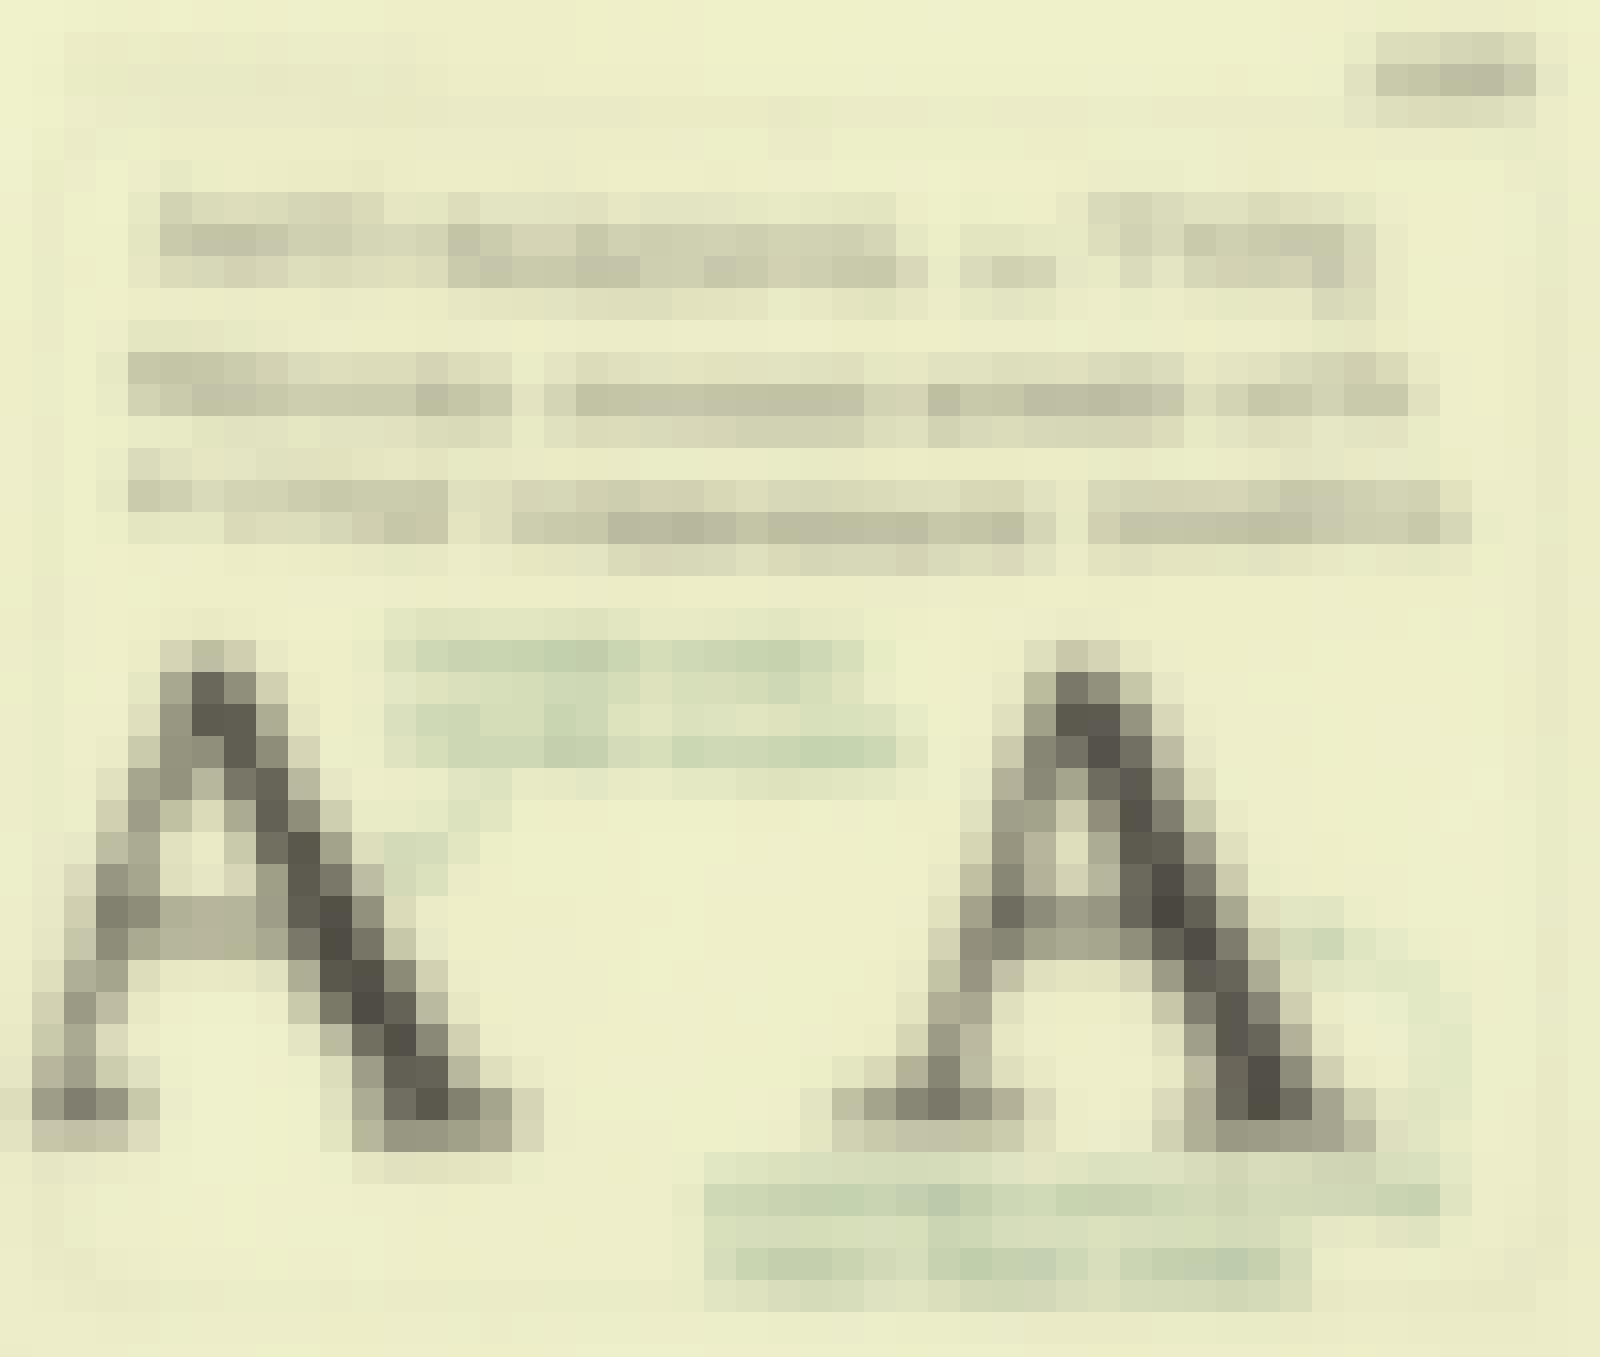 Anti-aliasing - Sketchplanations